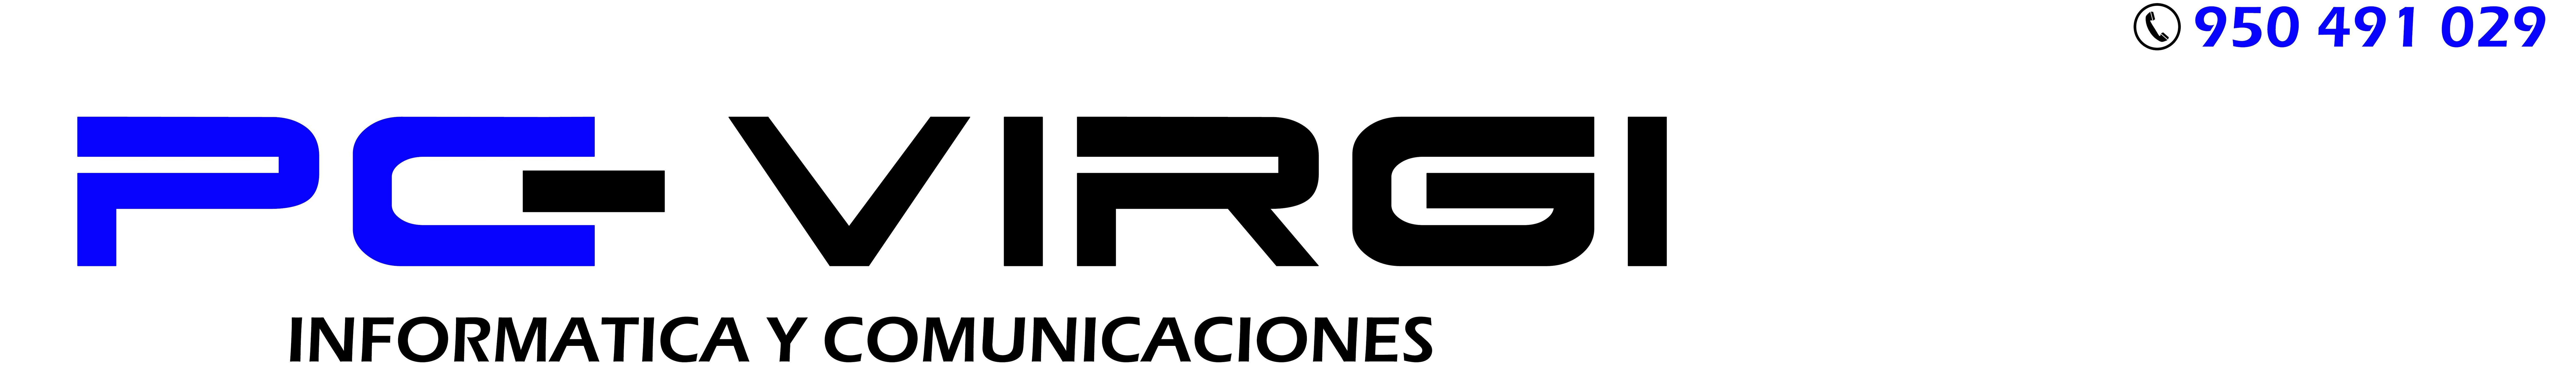 PC-VIRGI